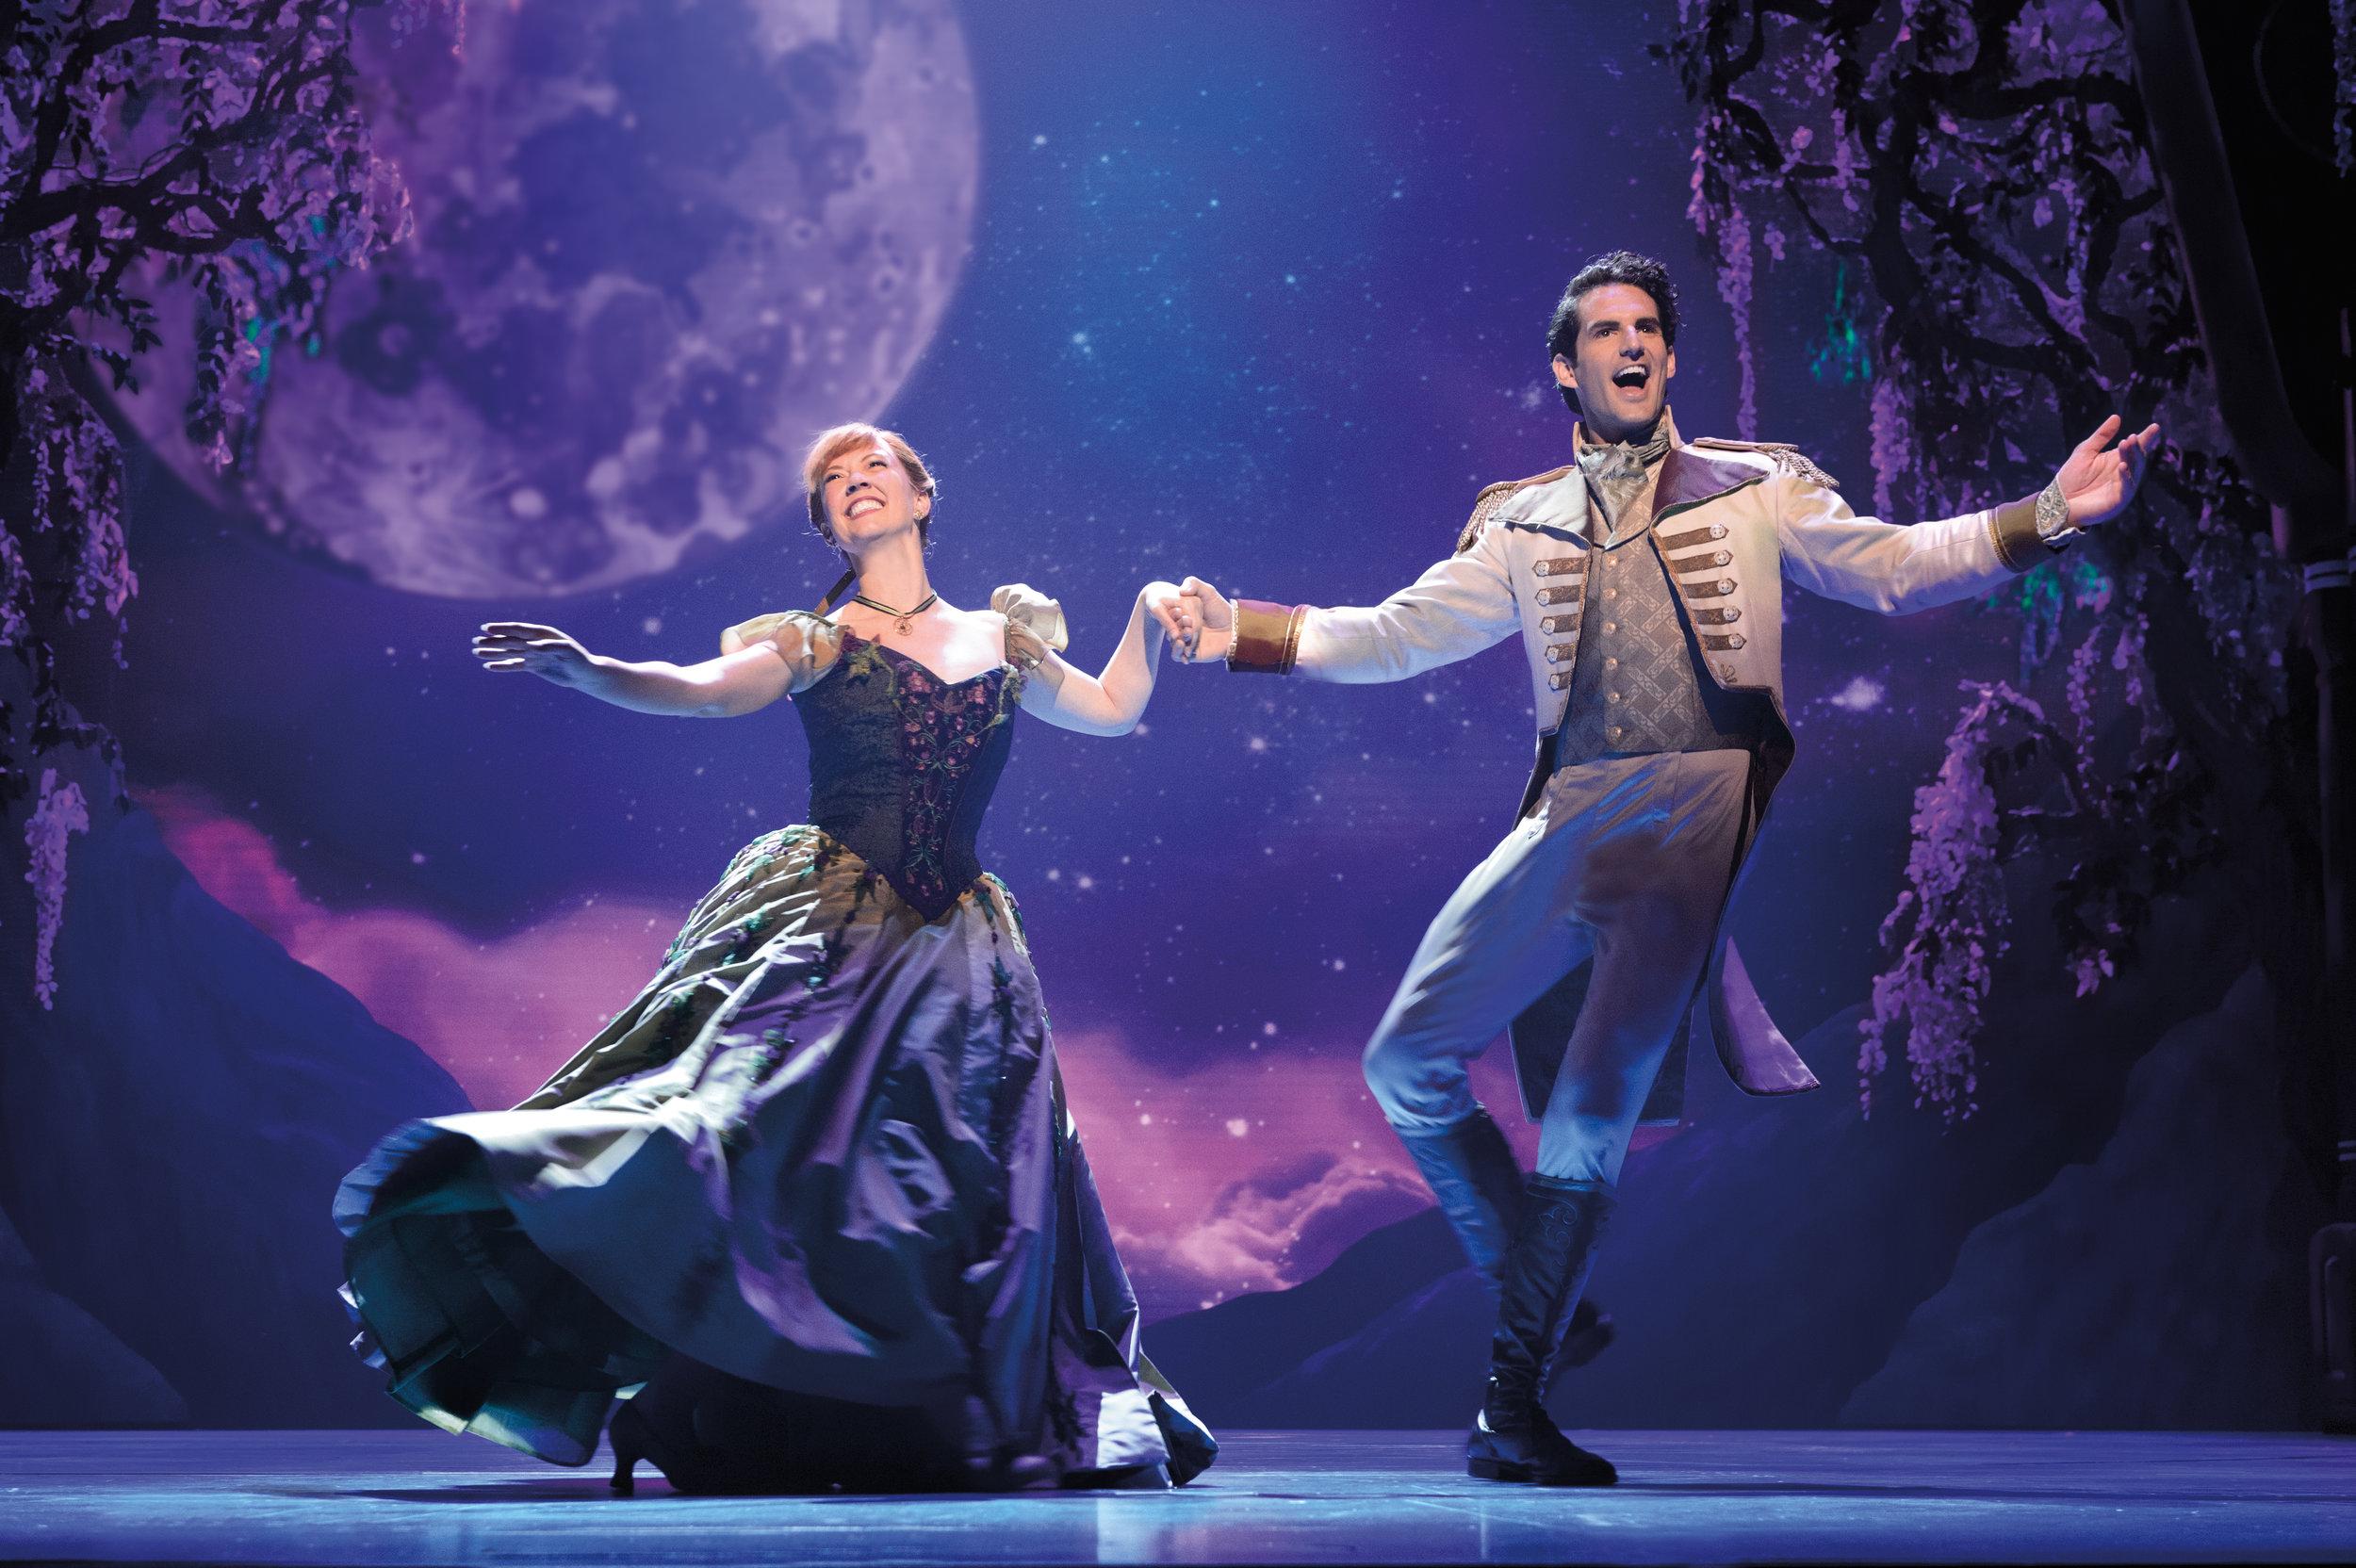 Patti Murin (Anna) and John Riddle (Hans) in FROZEN on Broadway. Photo by Deen van Meer.jpg